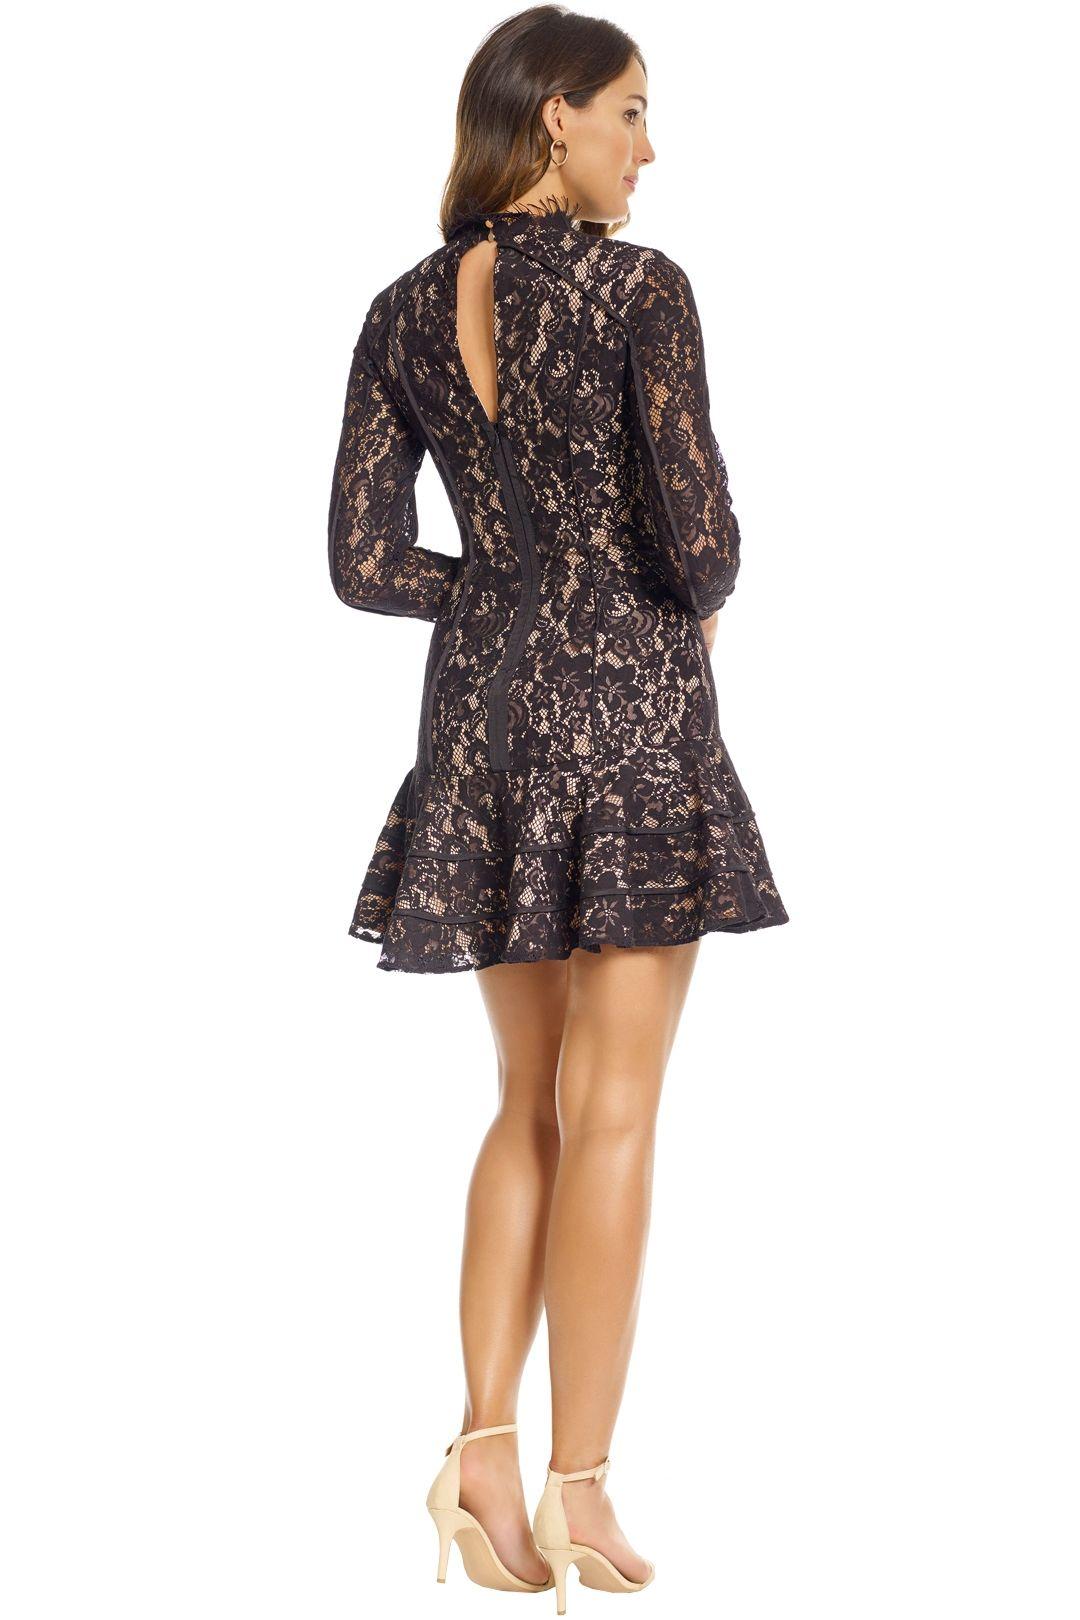 Keepsake the Label - Dreamers LS Lace Mini Dress - Black - Back